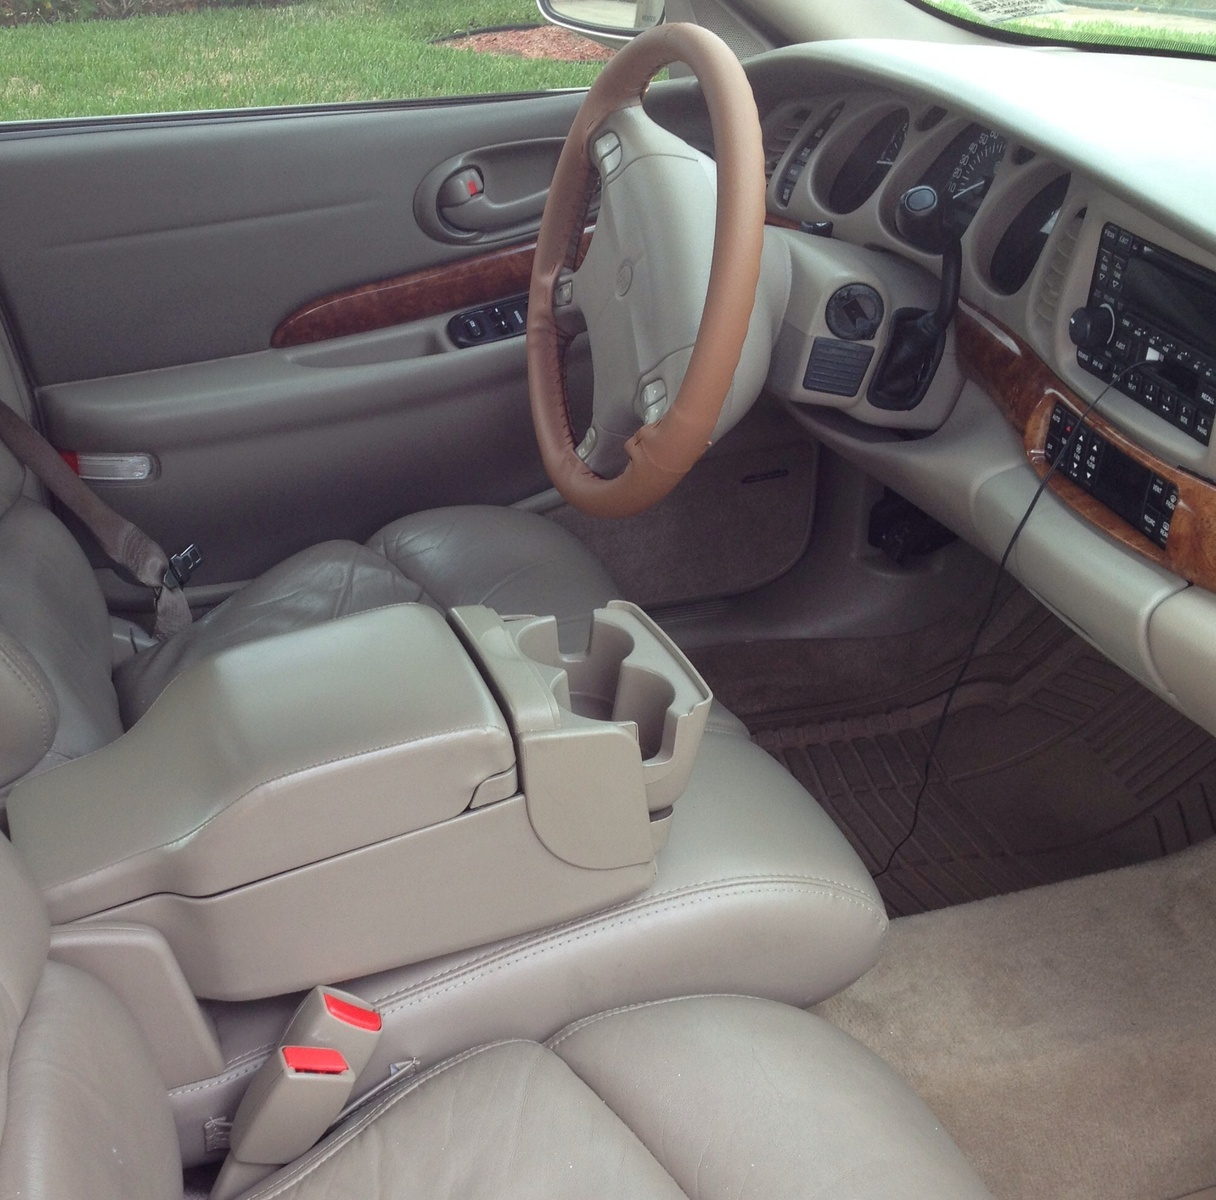 1995 Buick Roadmaster Interior: 2000 Buick LeSabre